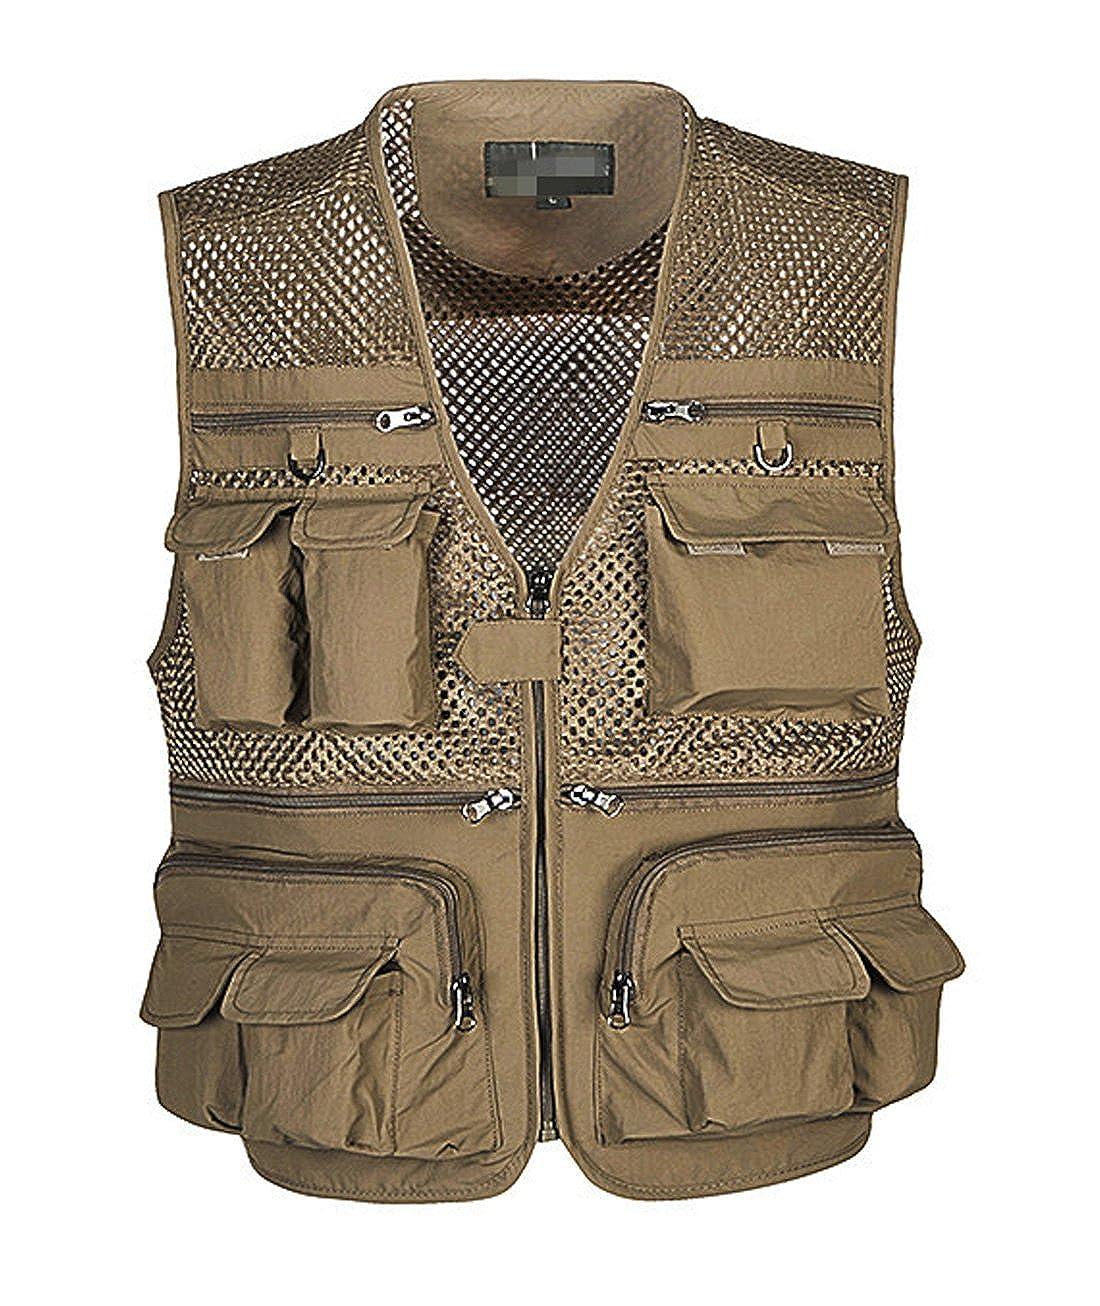 Gihuo Men's Summer Outdoor Work Safari Fishing Travel Vest Pockets